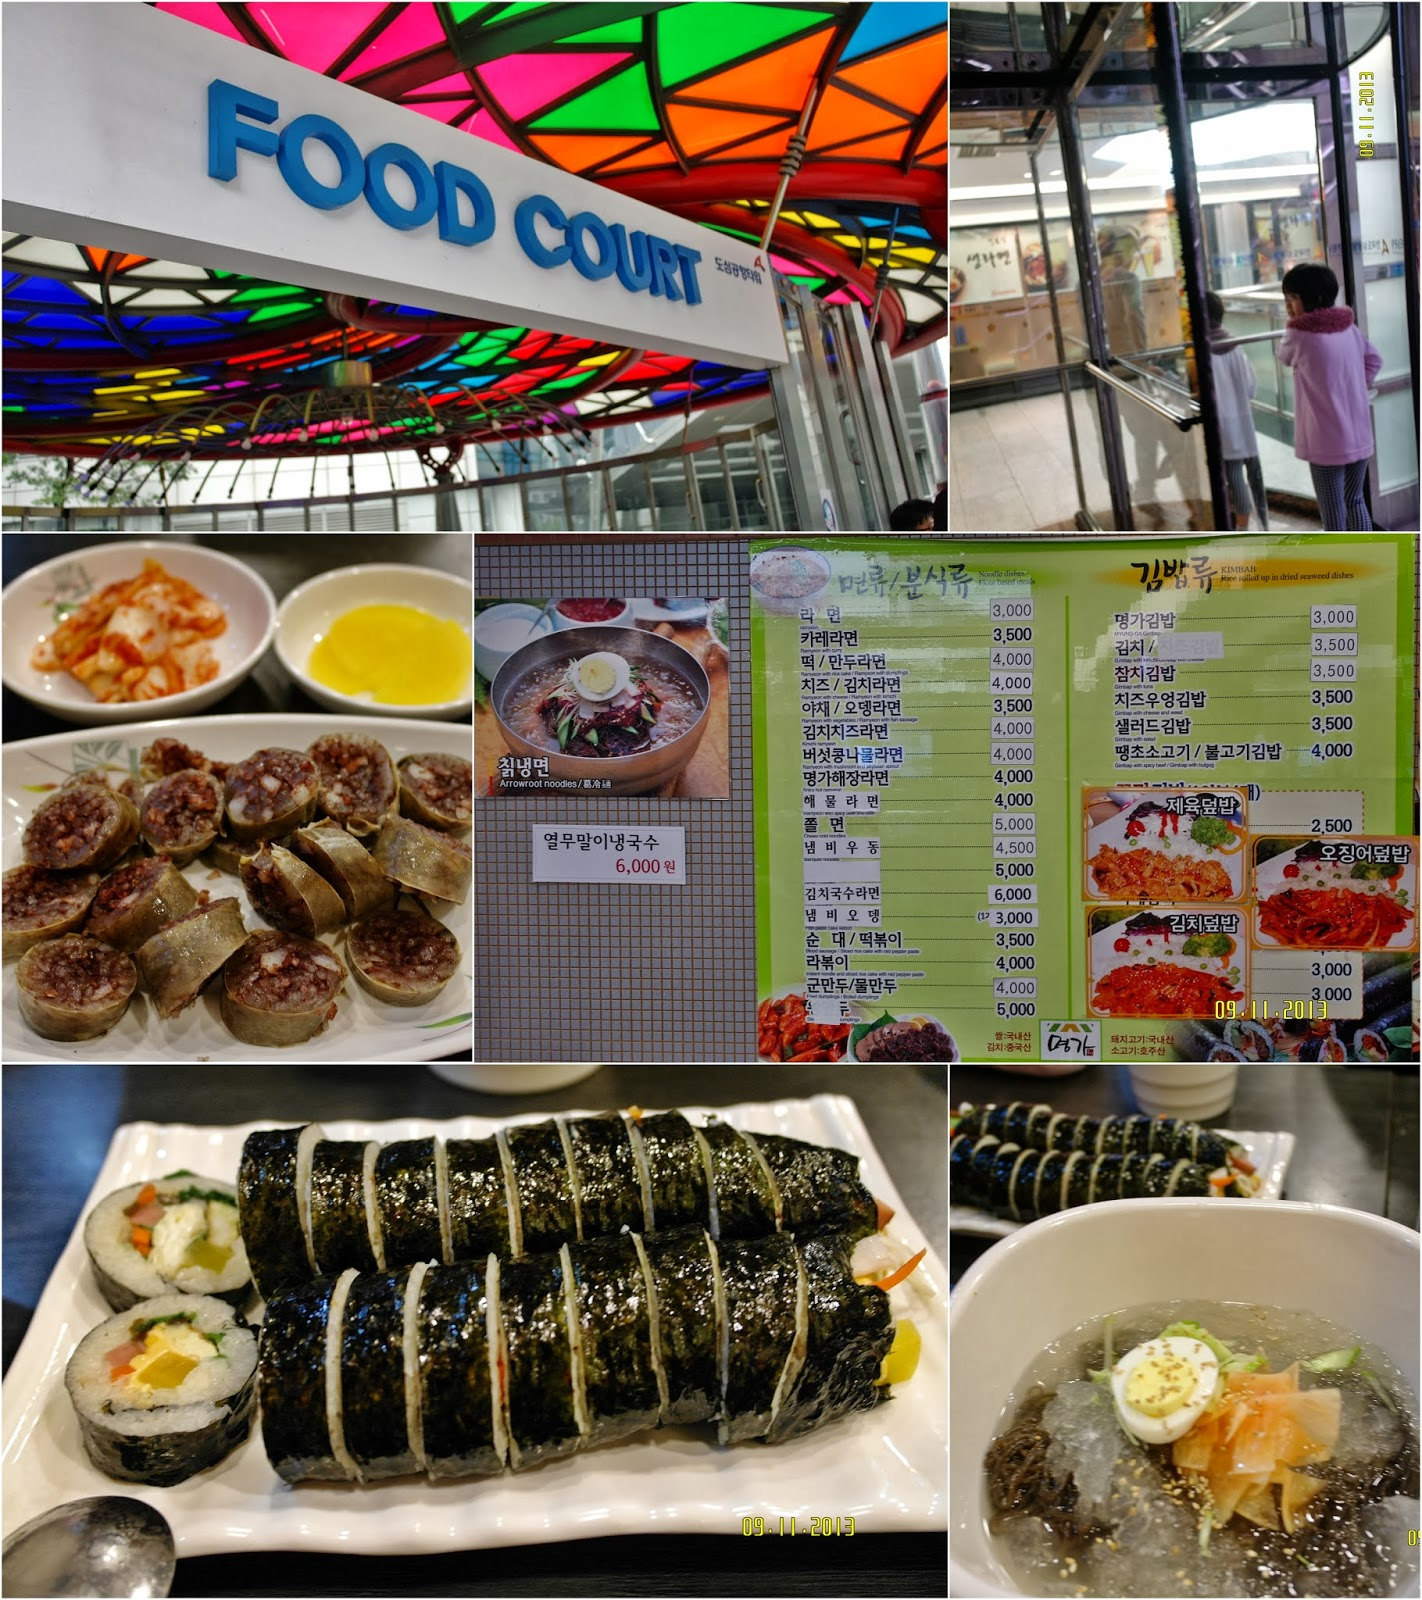 Megabox Food Court